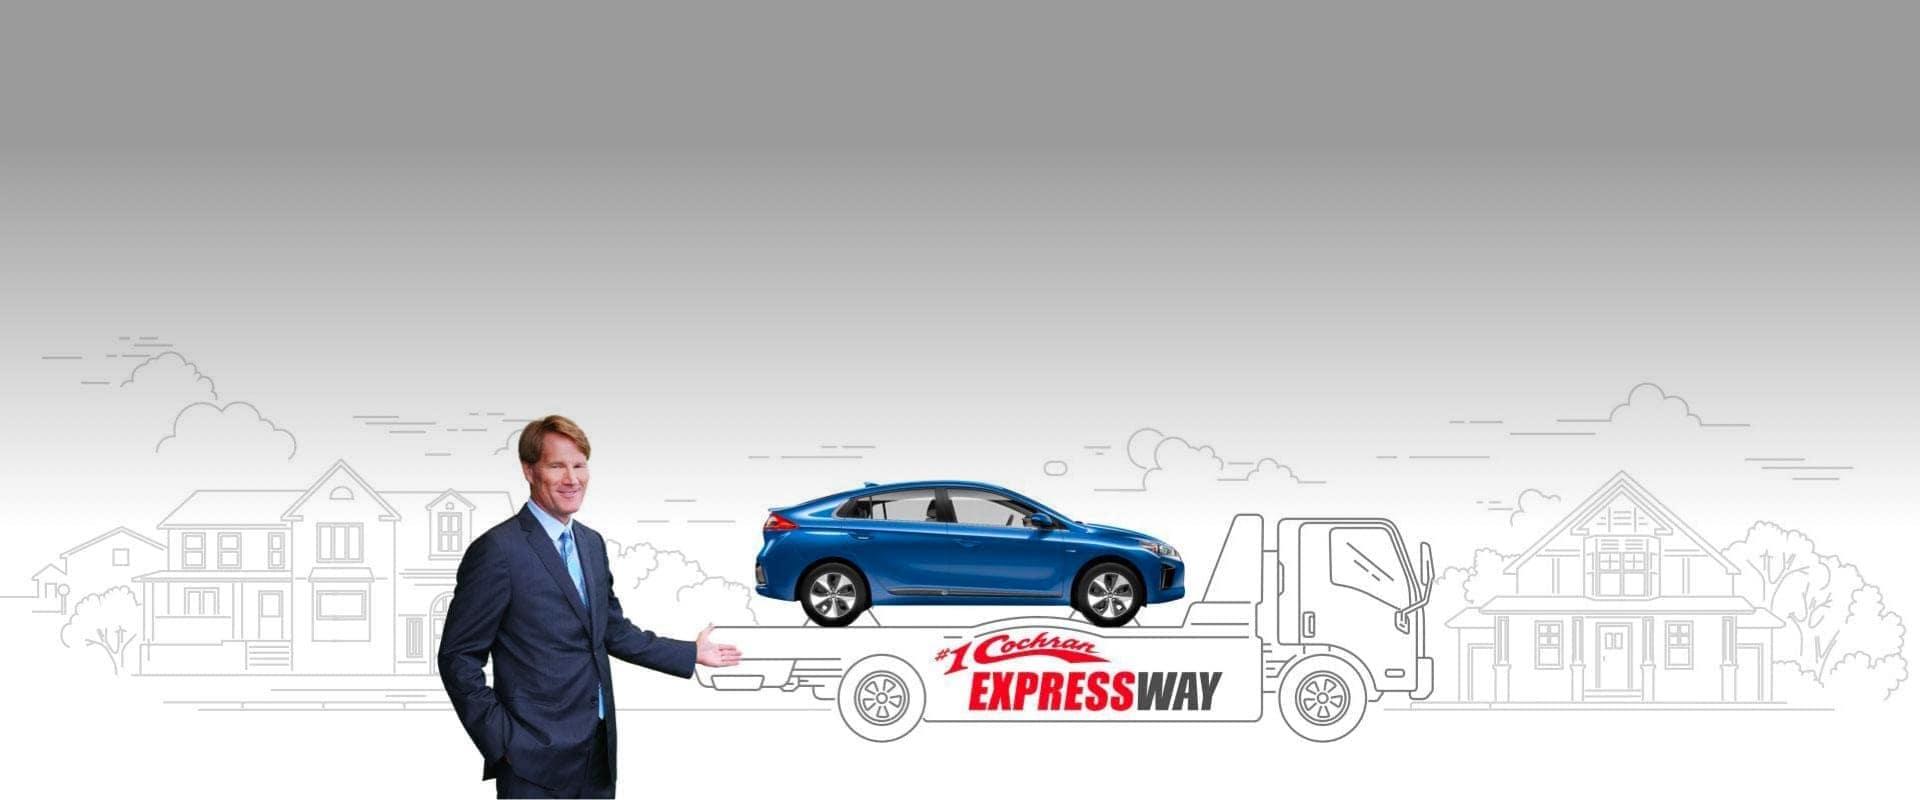 expressway-tow-hero-slide